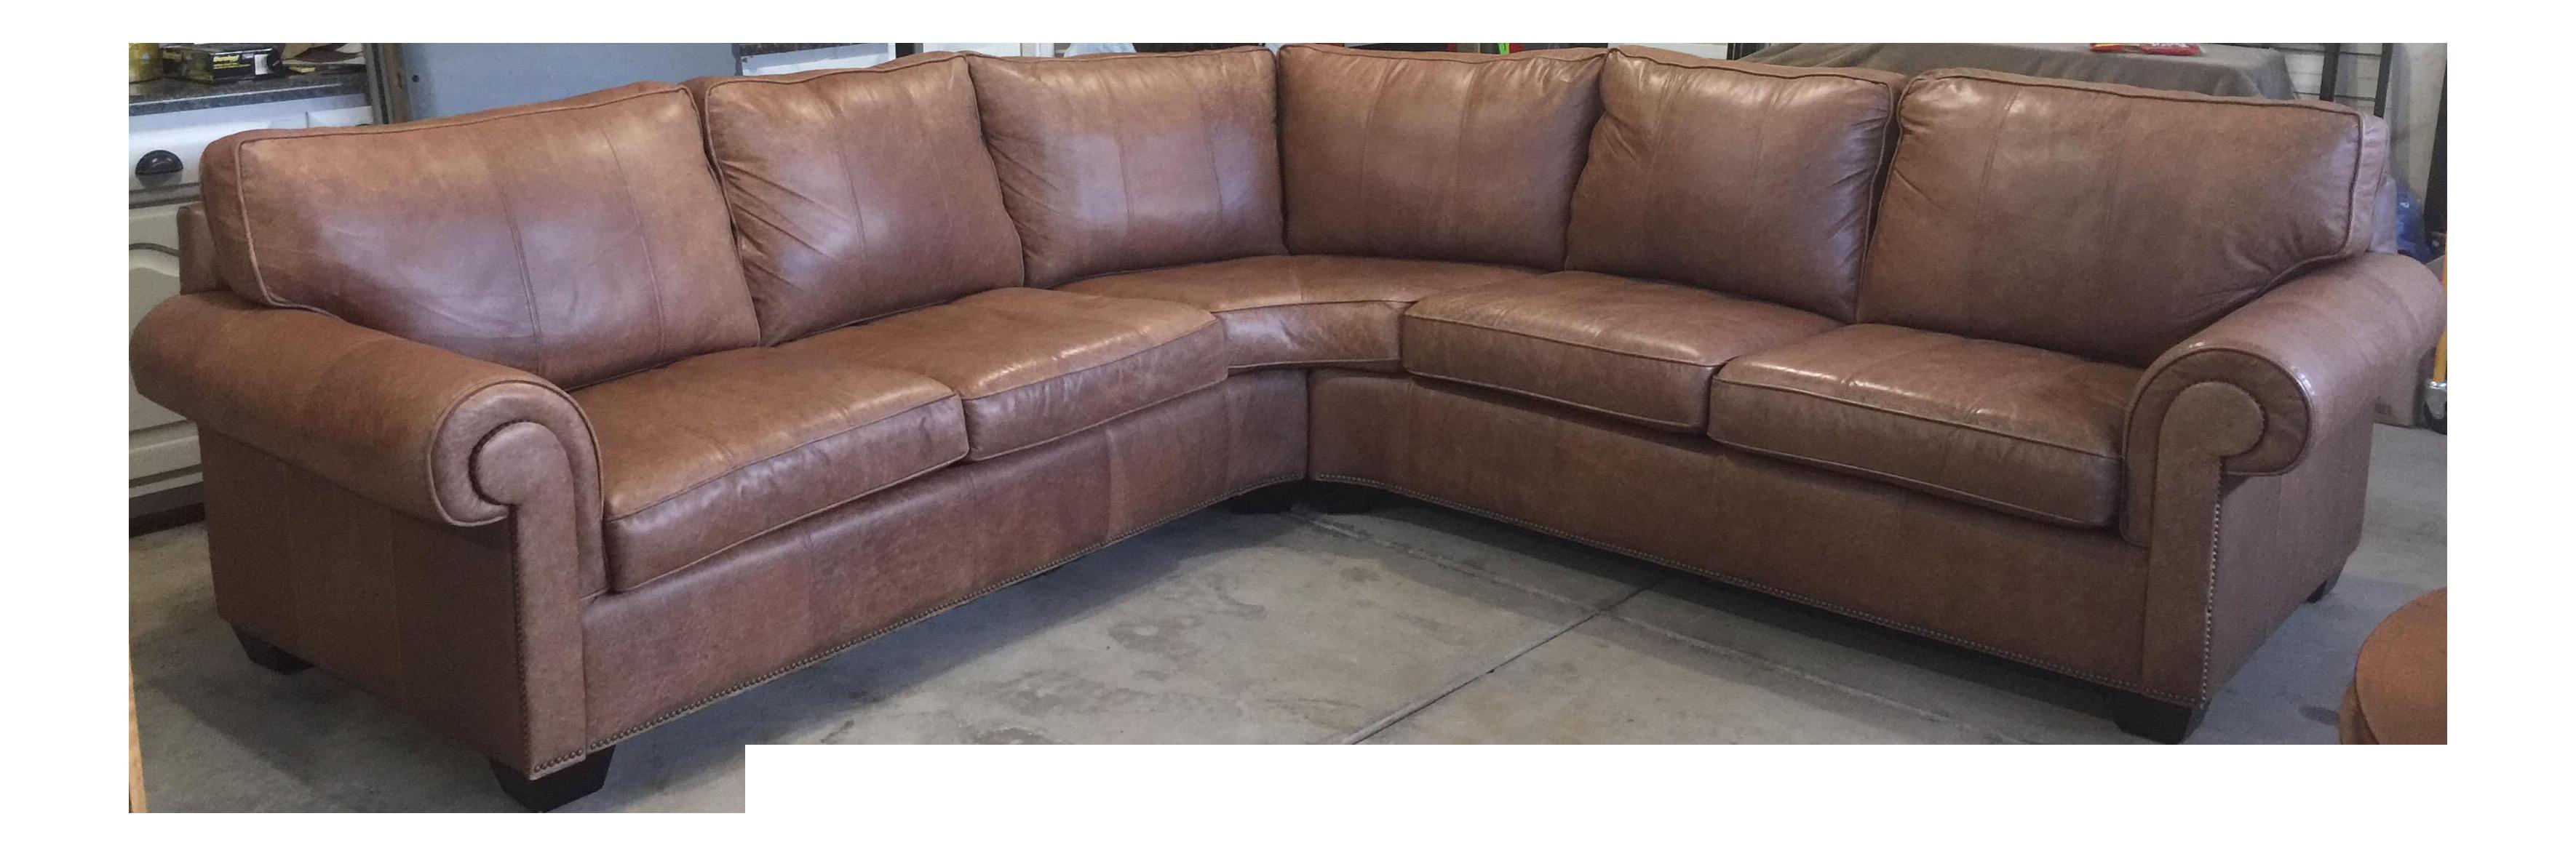 Bernhardt Essex Leather Sectional  sc 1 st  Chairish : bernhardt leather sectional - Sectionals, Sofas & Couches